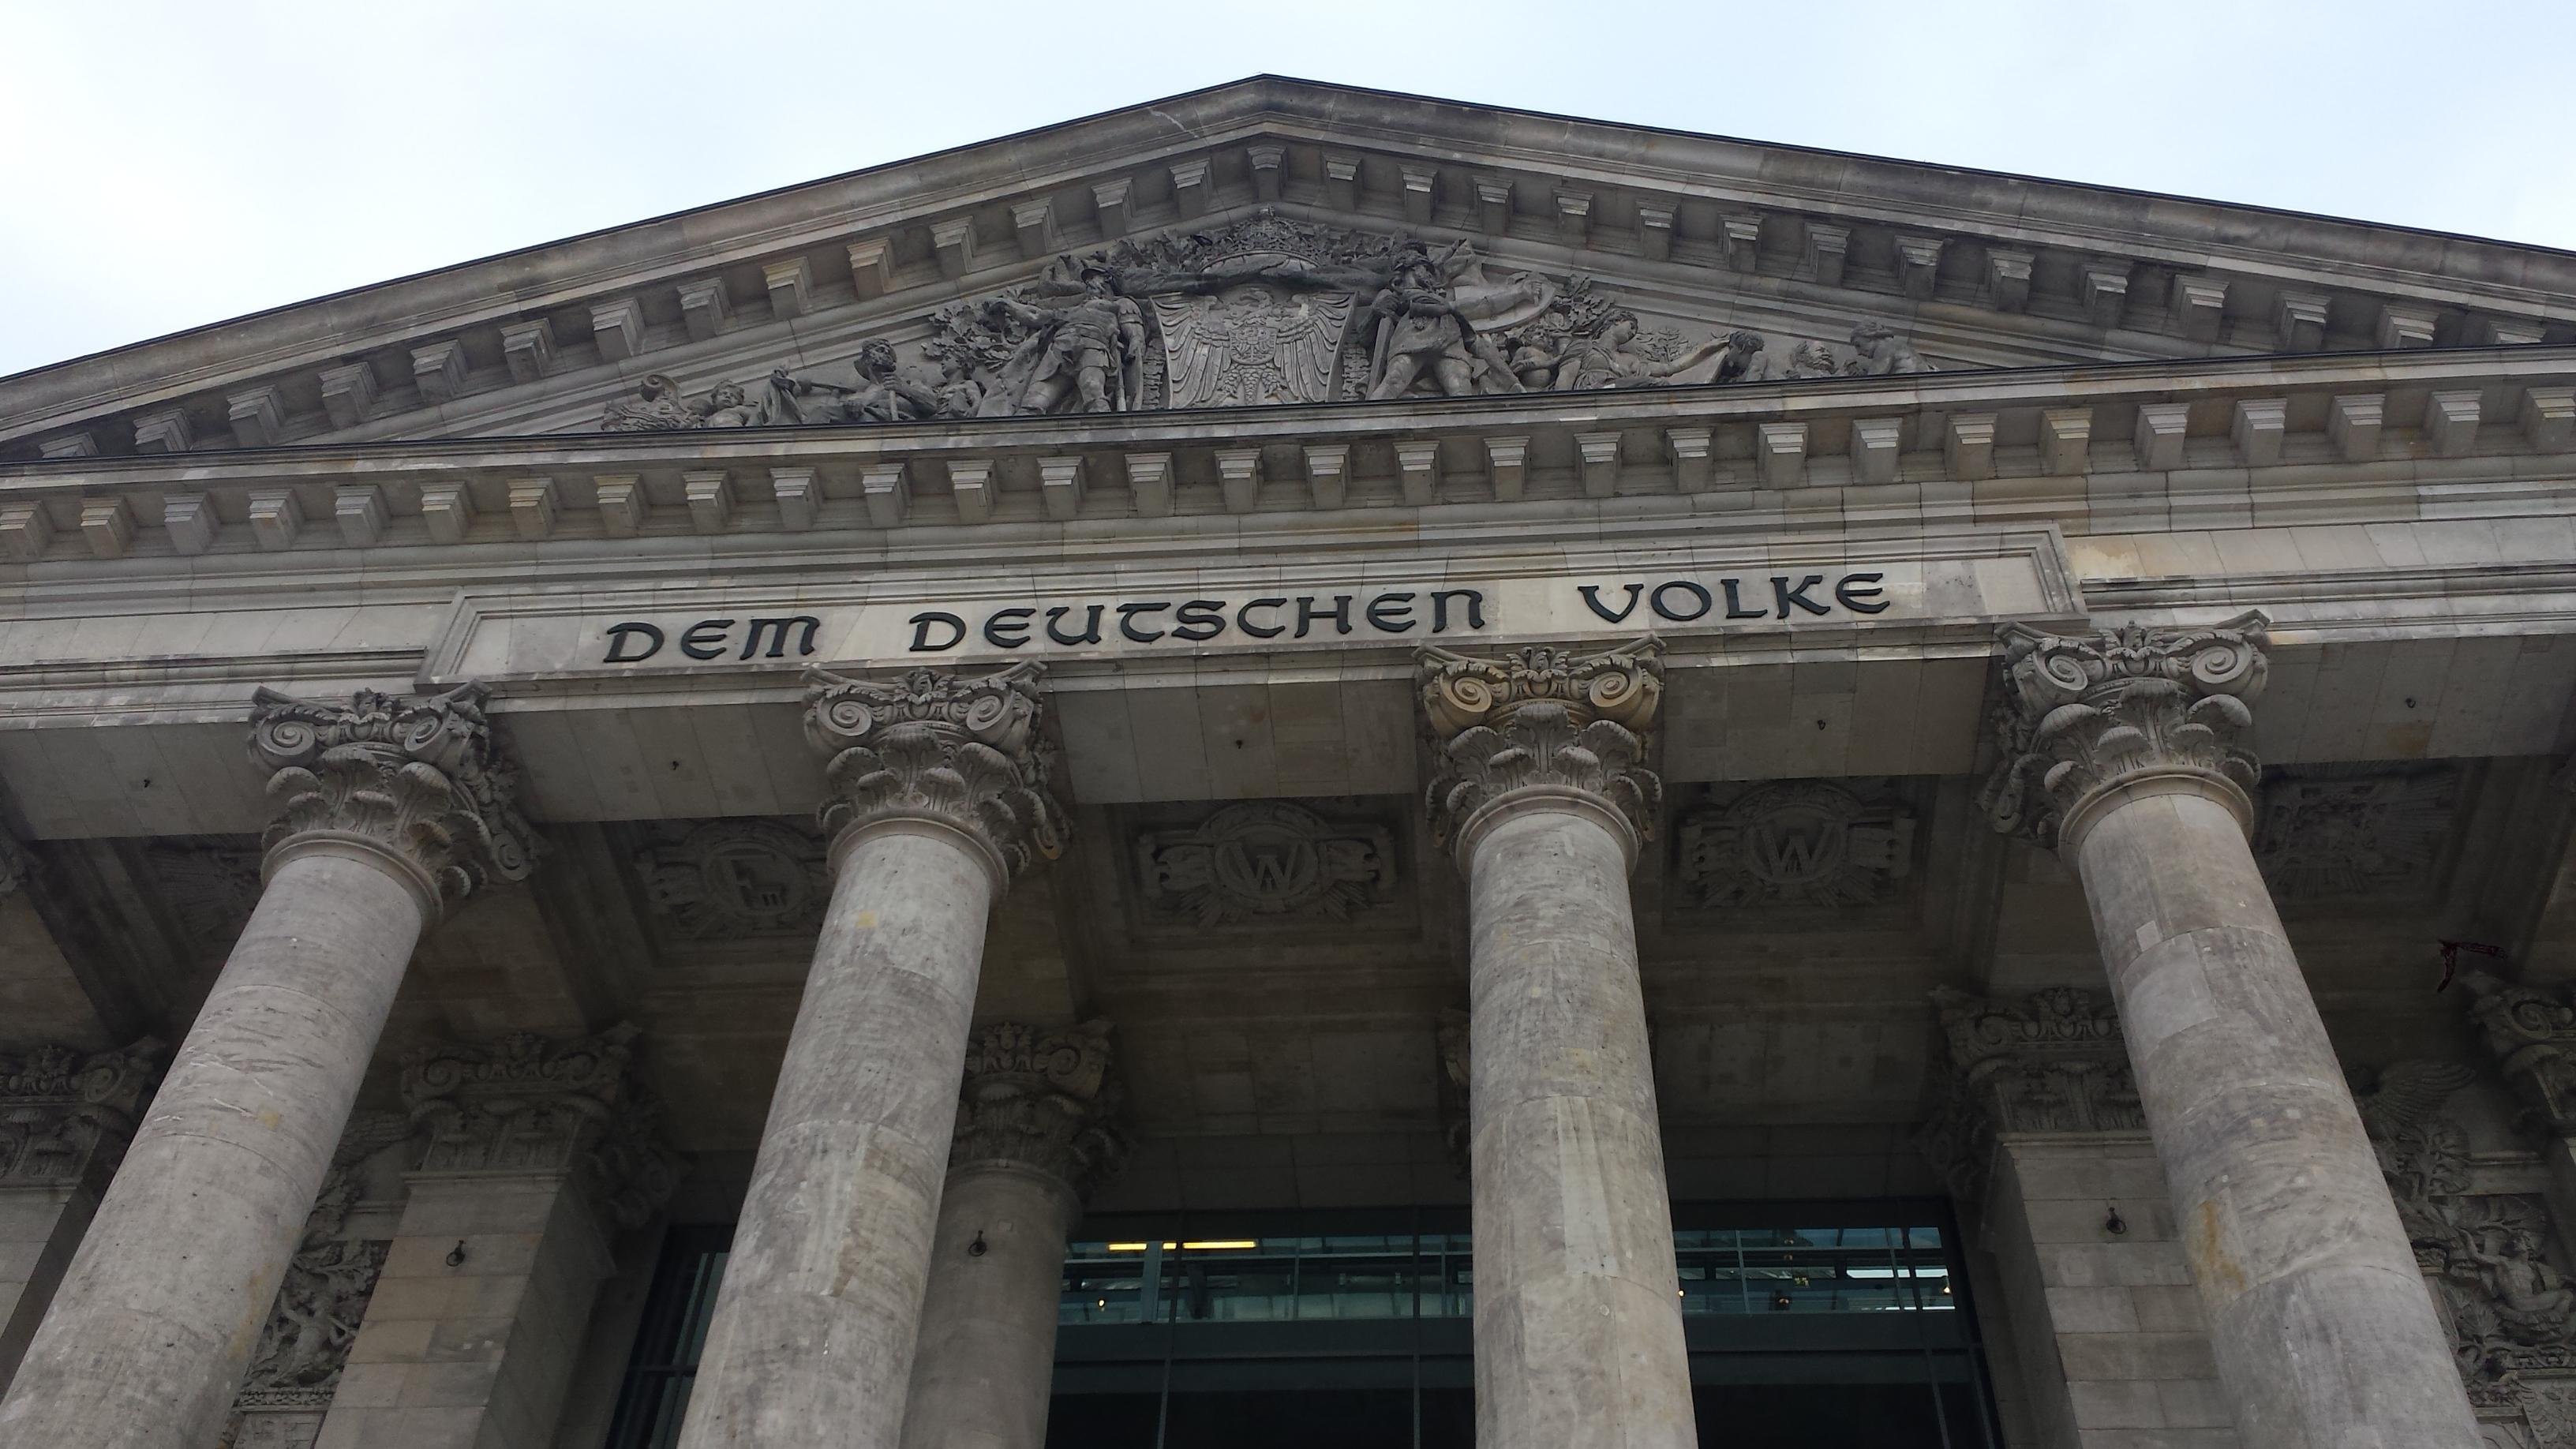 Impressionen aus Berlin, Tag 3